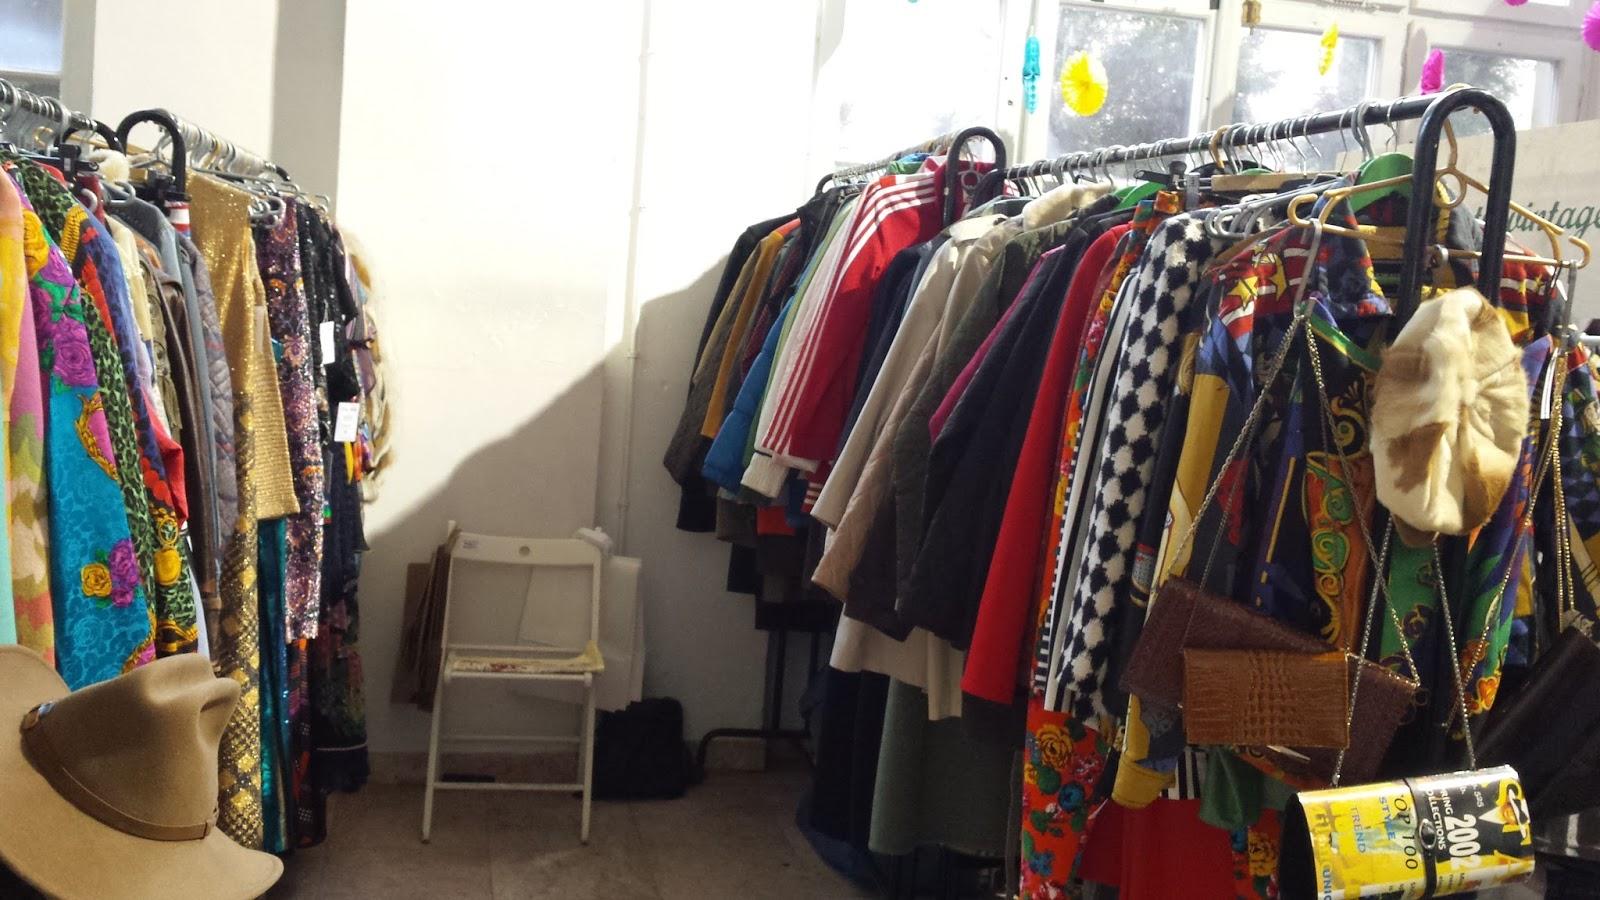 Vintage Store, Warsaw Vintage Market, Niebo, targi mody vintage, blog modowy, zrównoważona moda